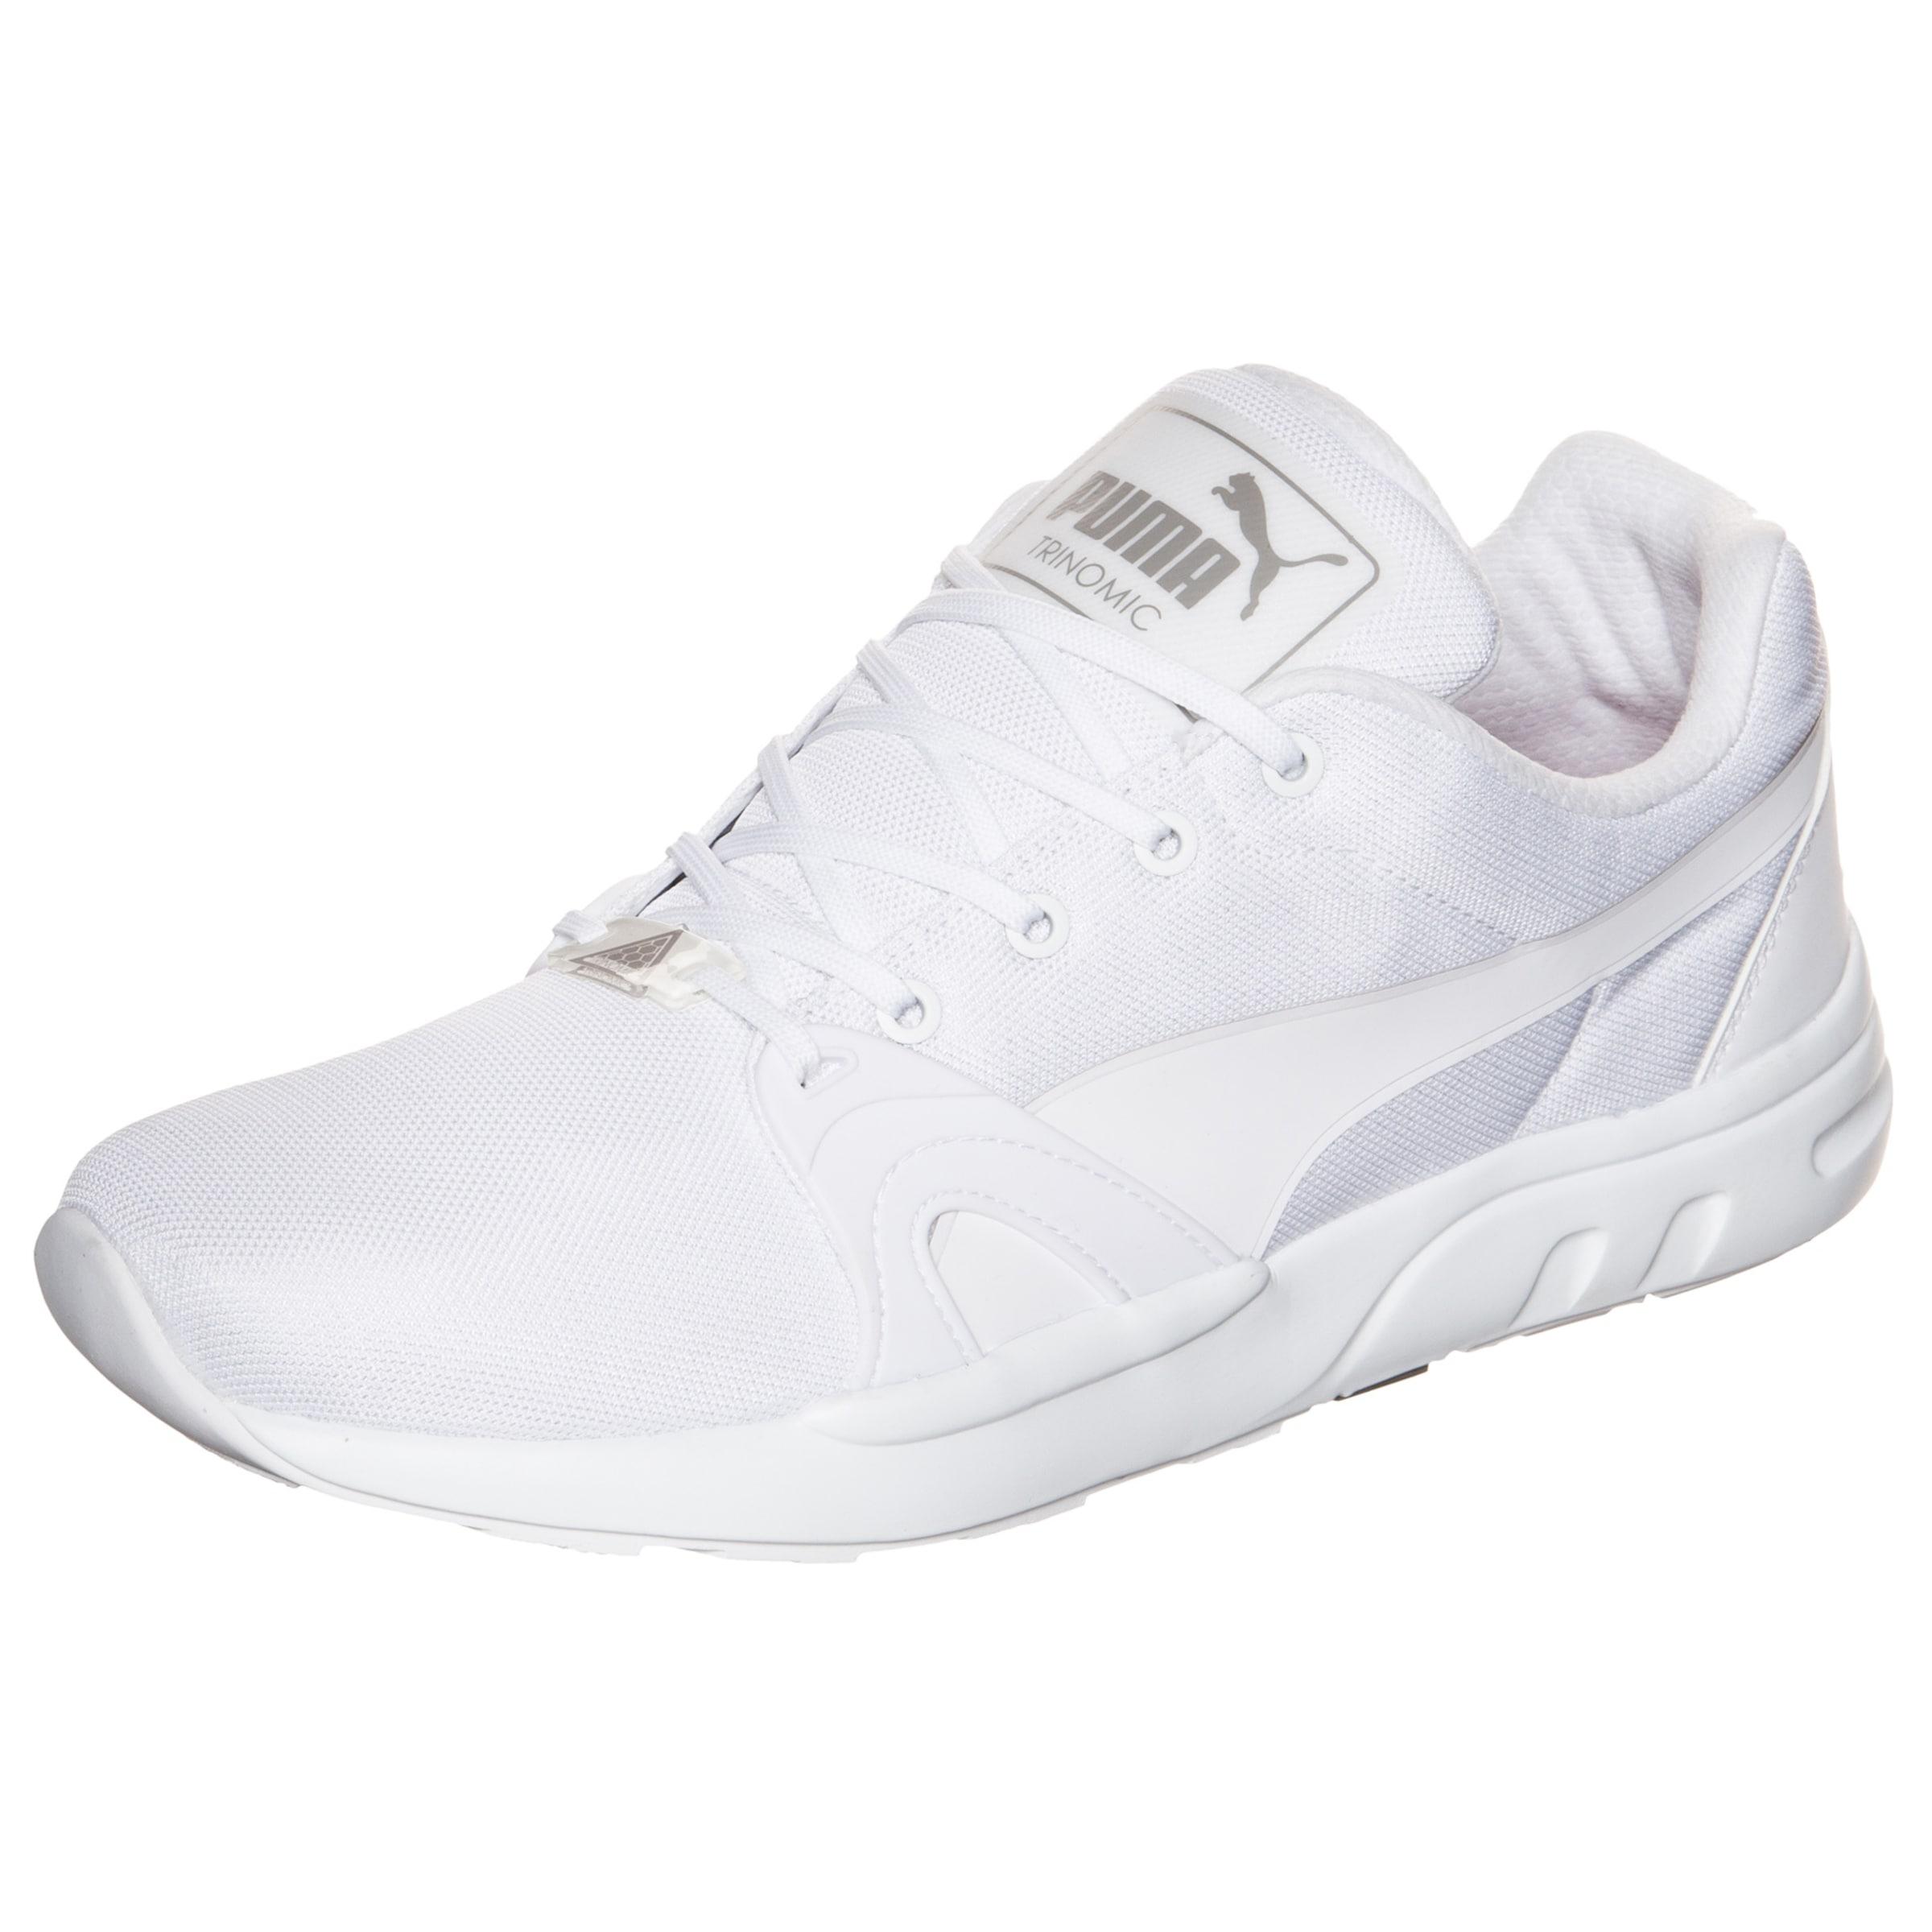 PUMA Sneaker XT S Verschleißfeste billige Schuhe